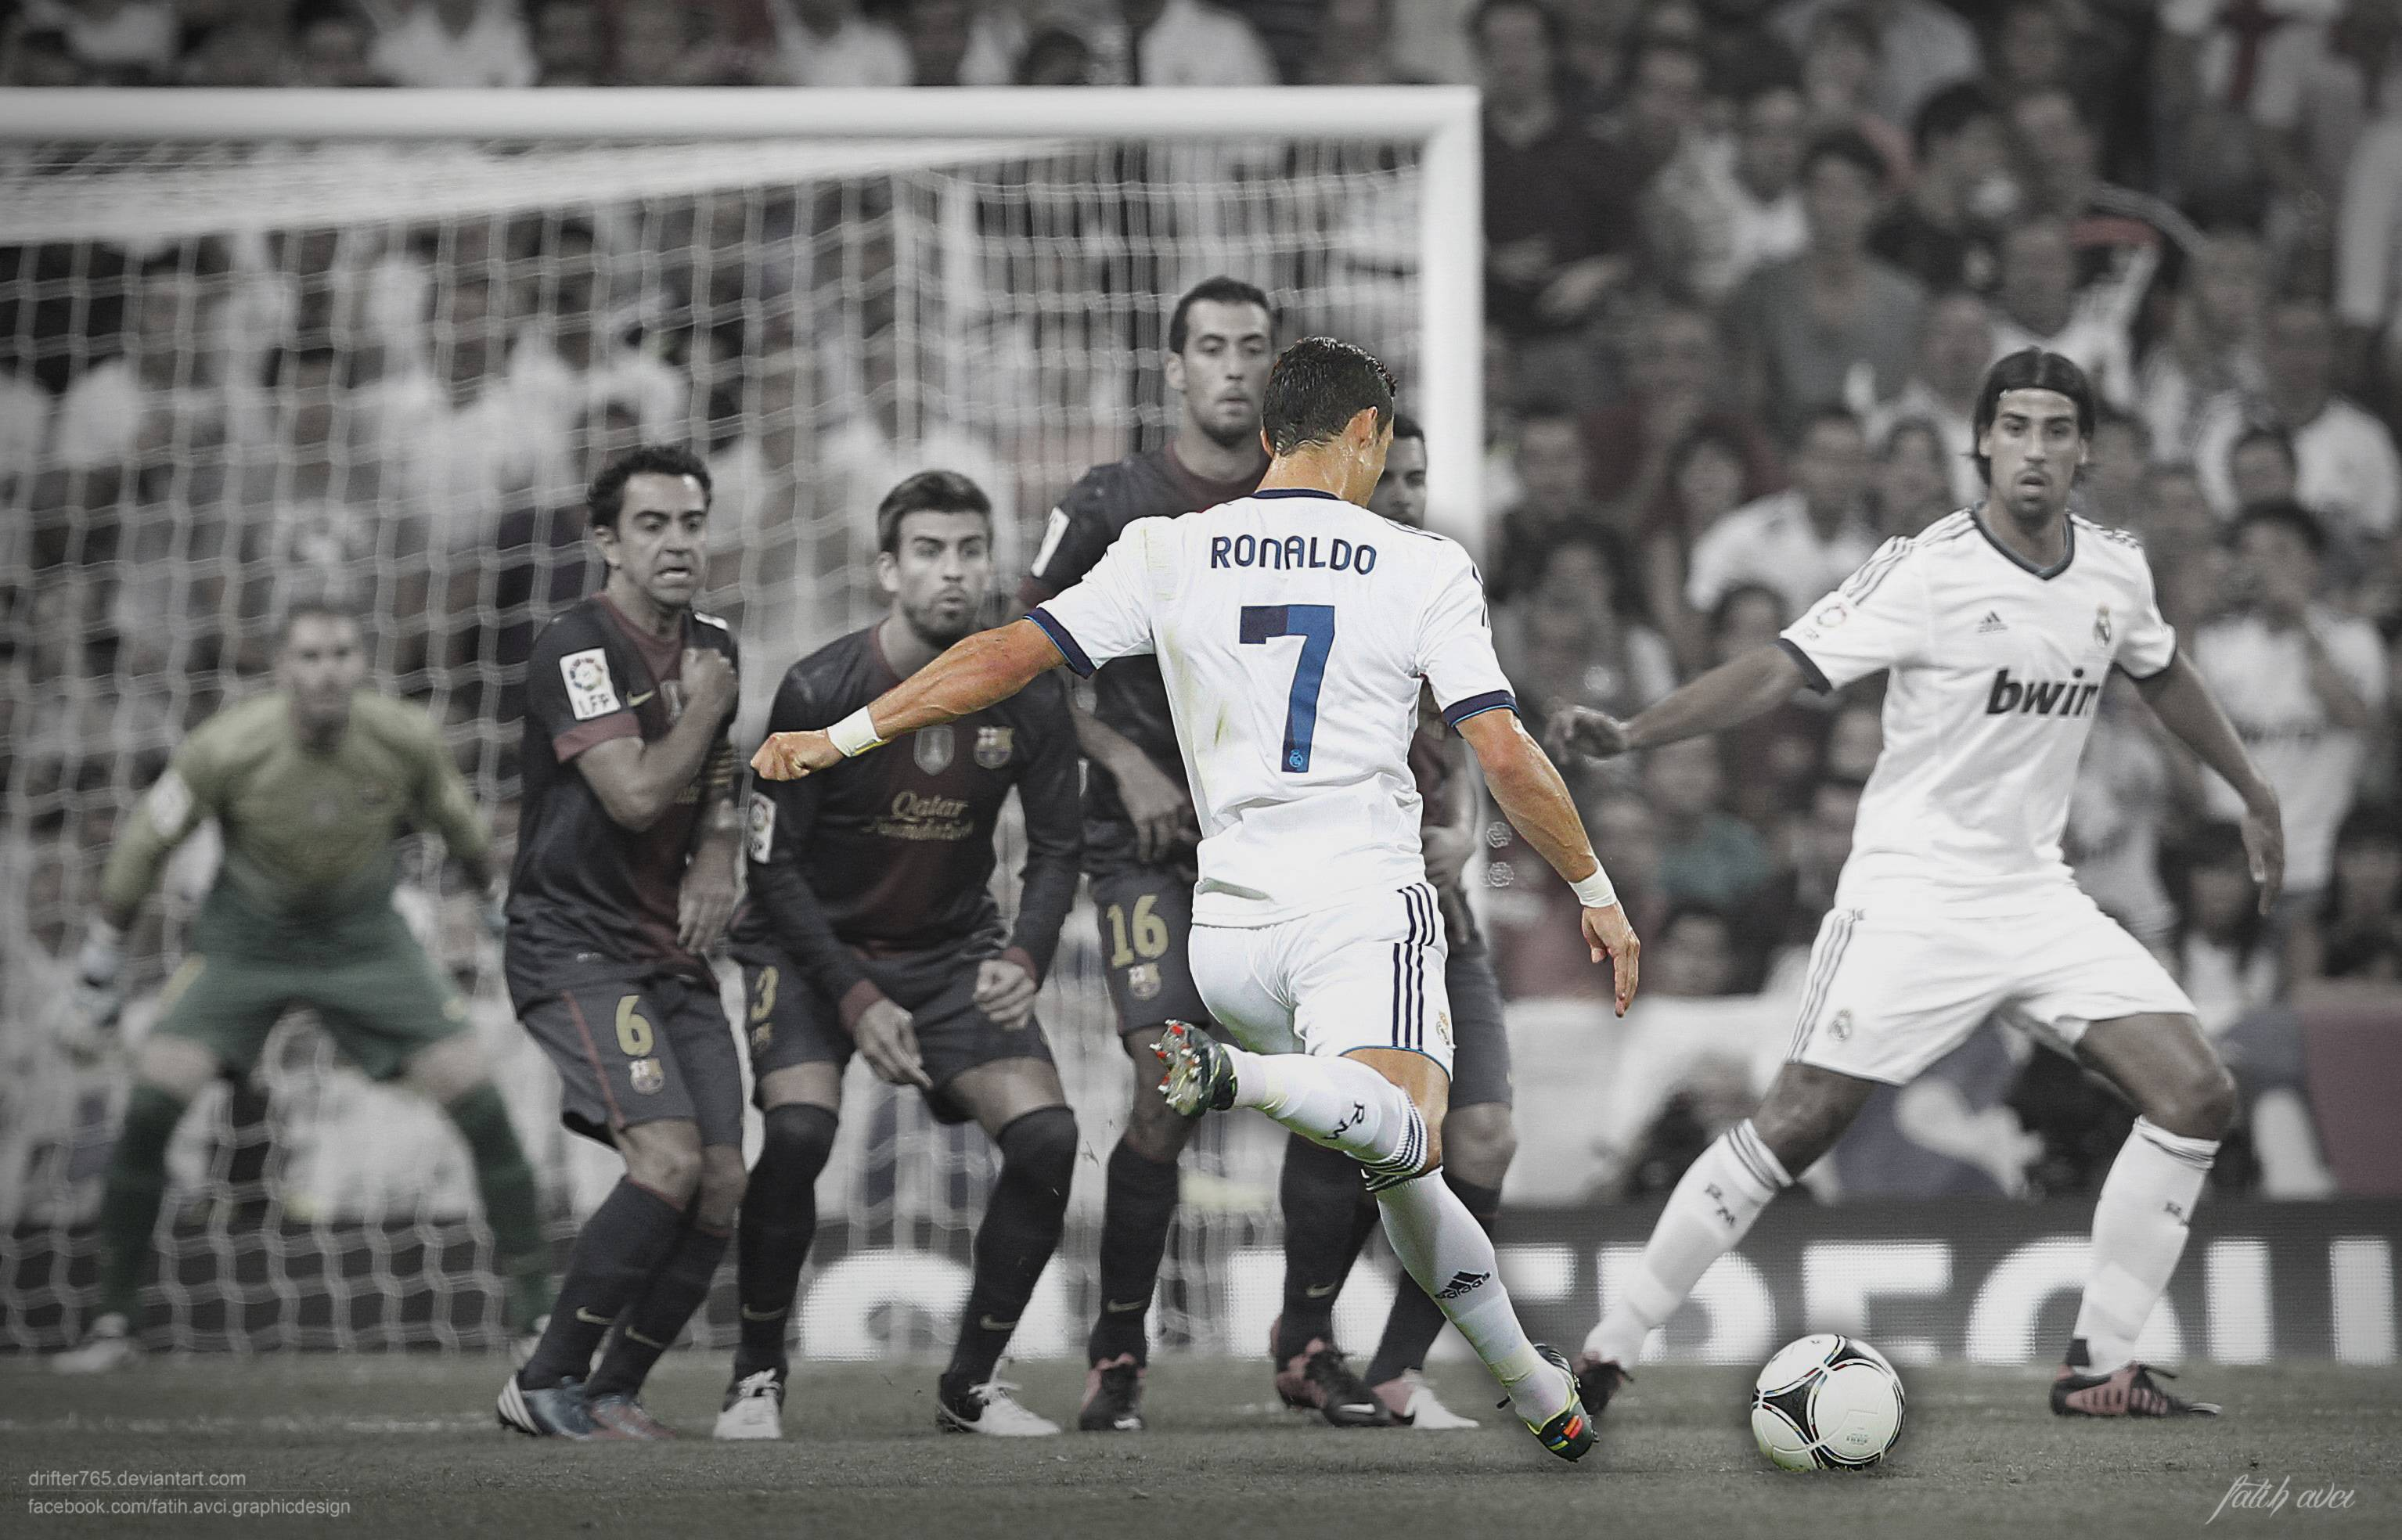 Cristiano Ronaldo Free Kick Wallpaper | HD Wallpapers